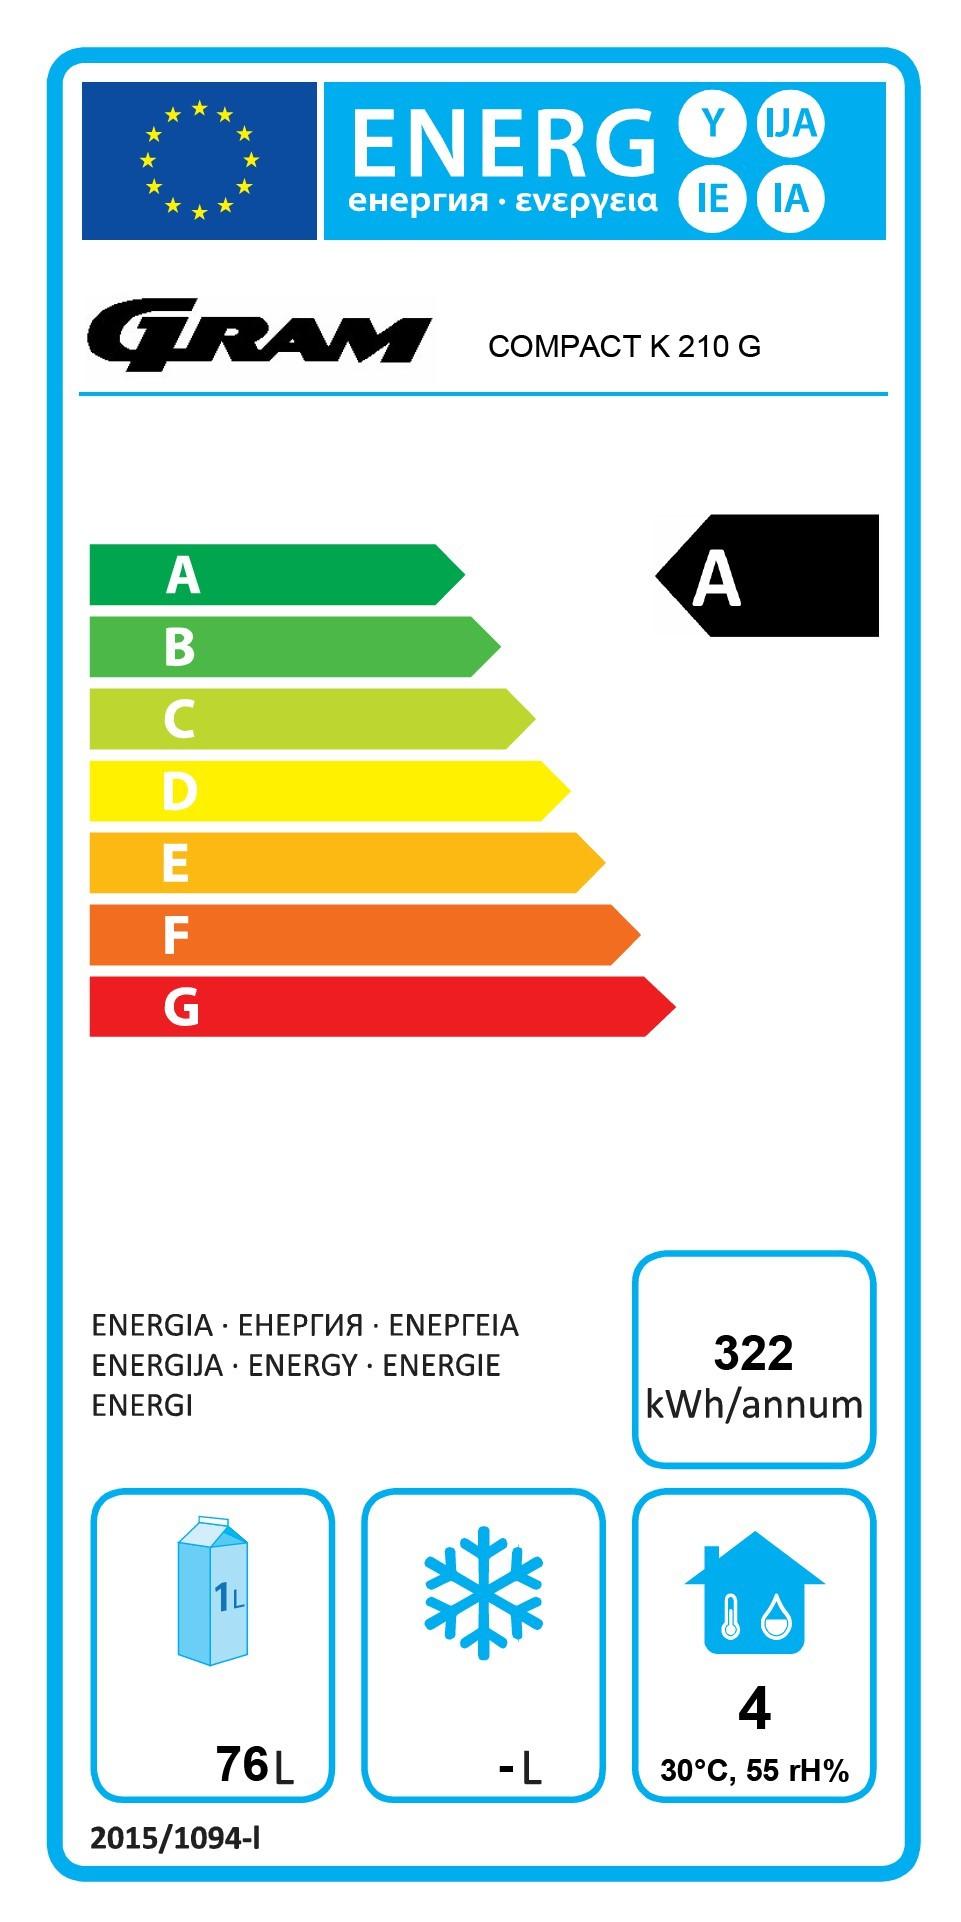 COMPACT K 210 LG 3W 125 Ltr Undercounter Fridge Energy Rating